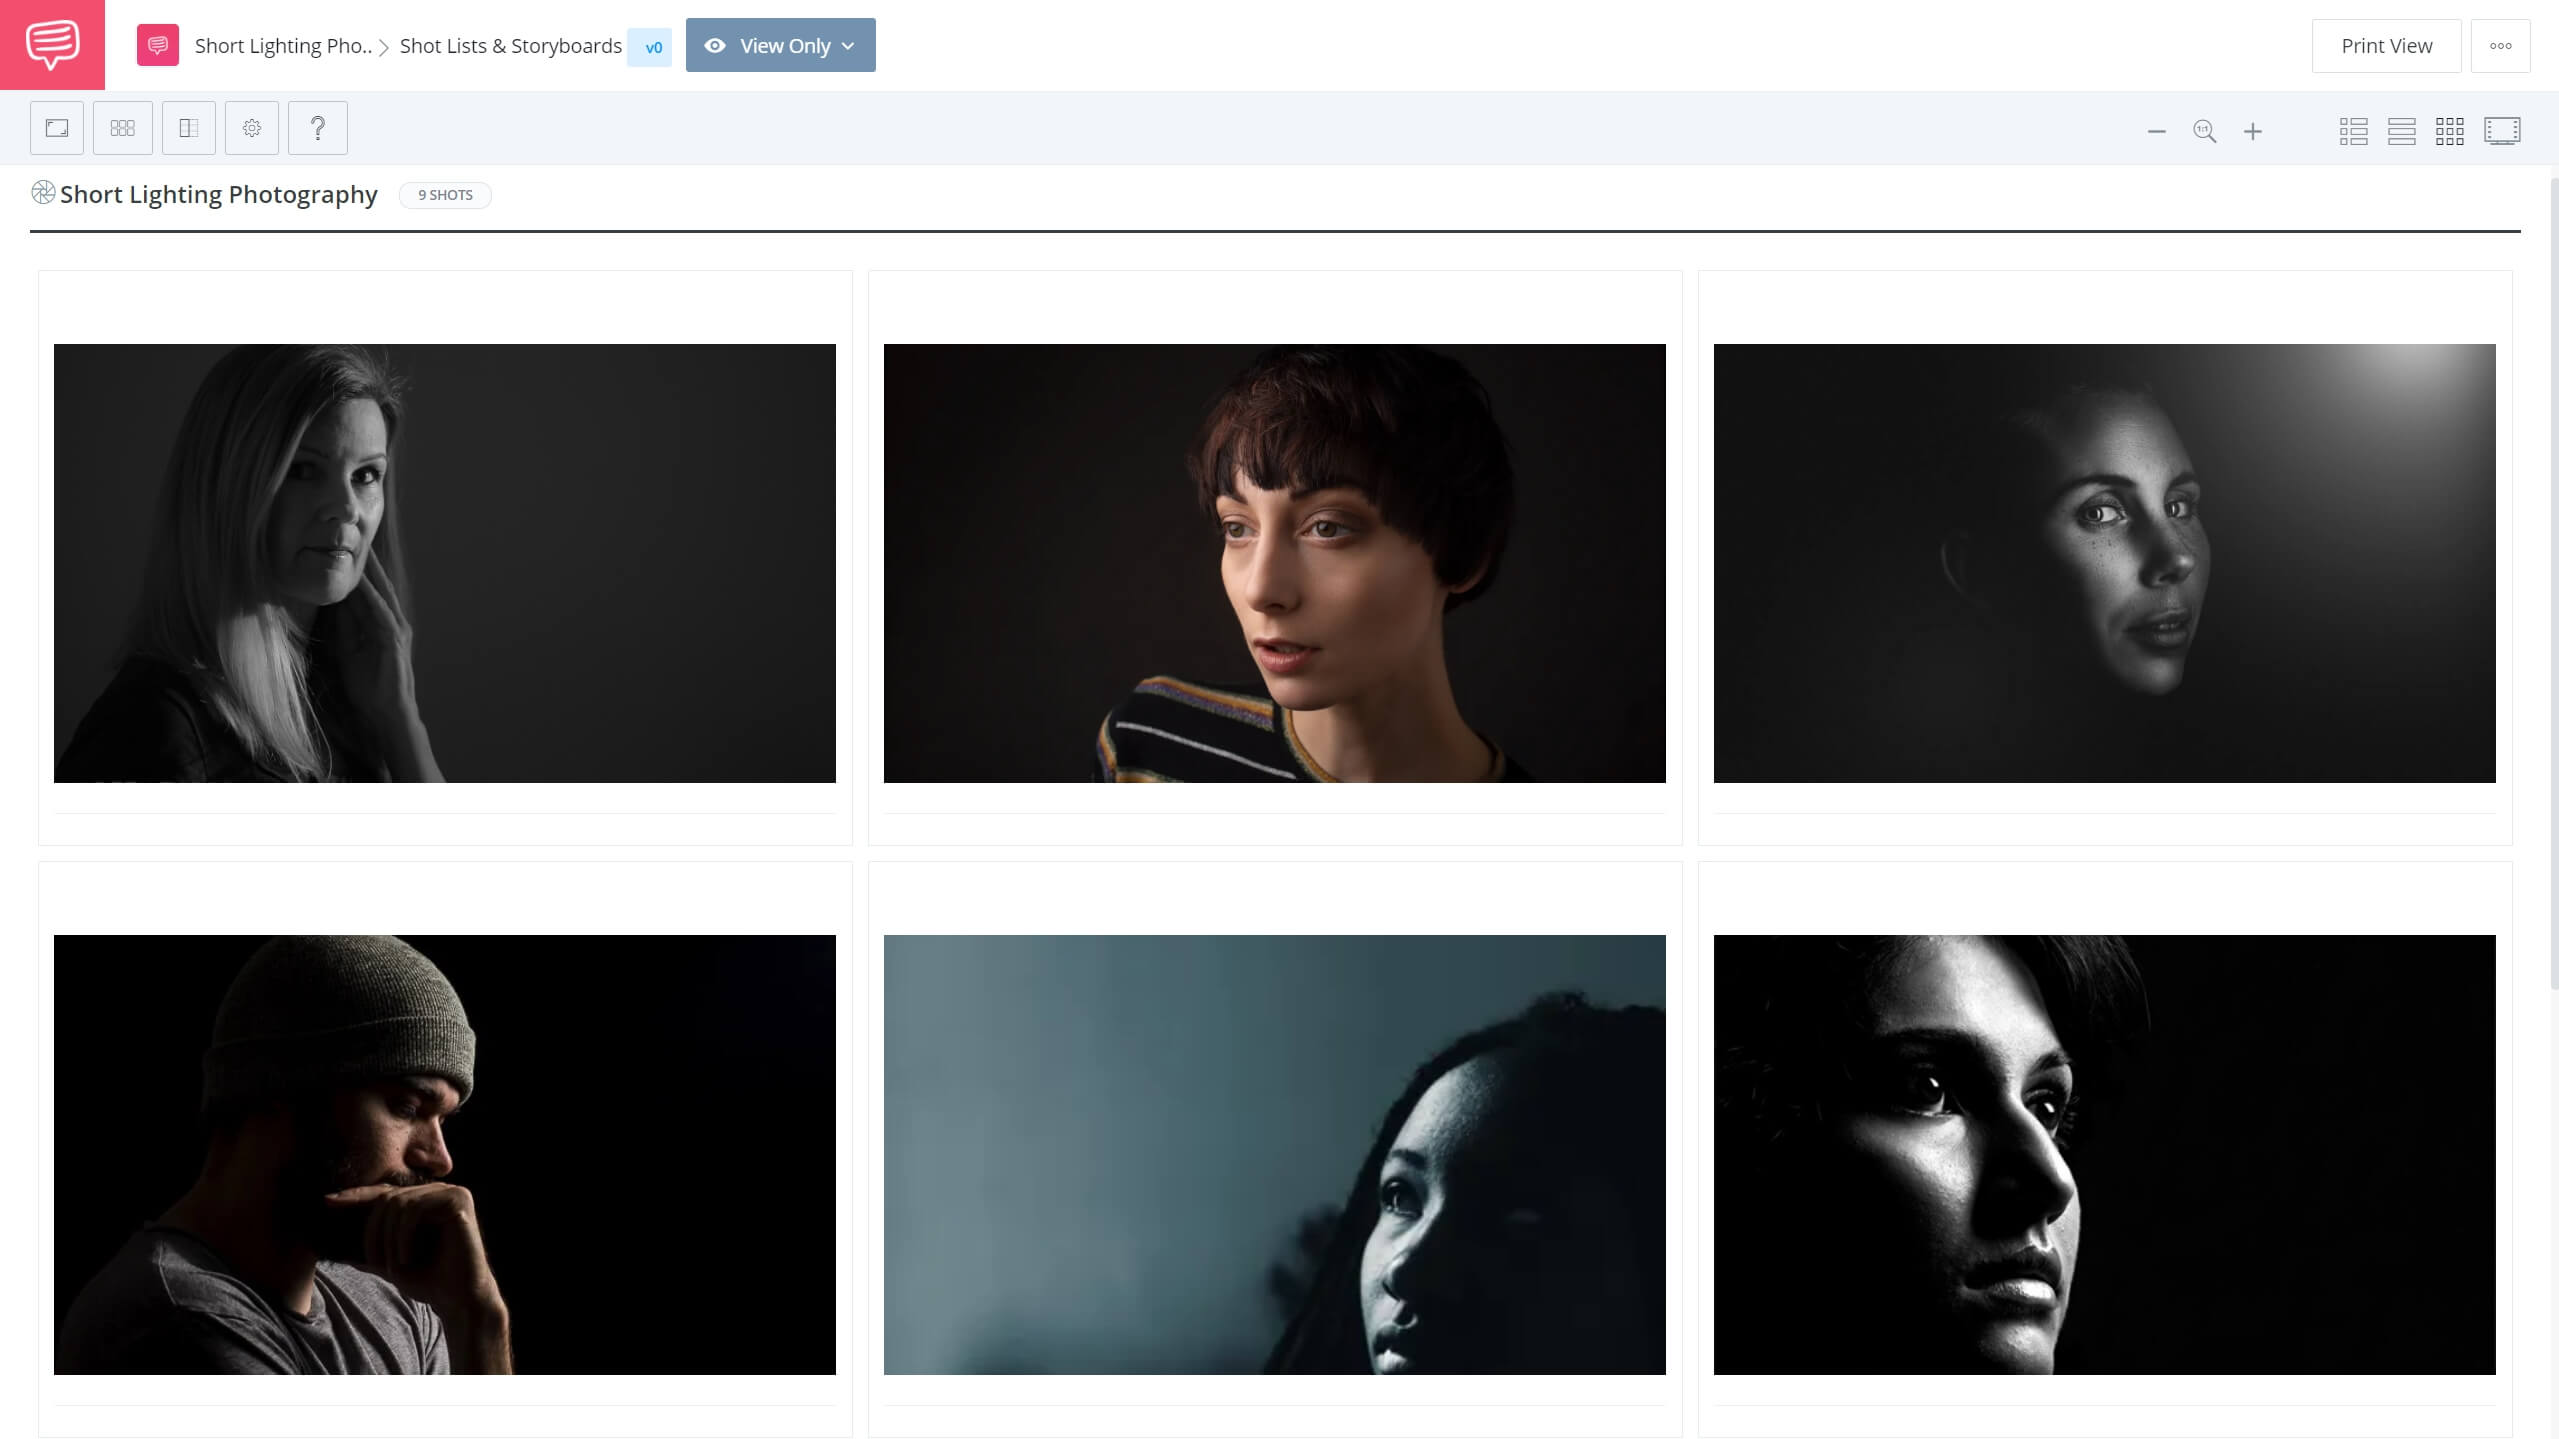 What is Short Lighting Photography Short Lighting StudioBinder Shot Listing Software